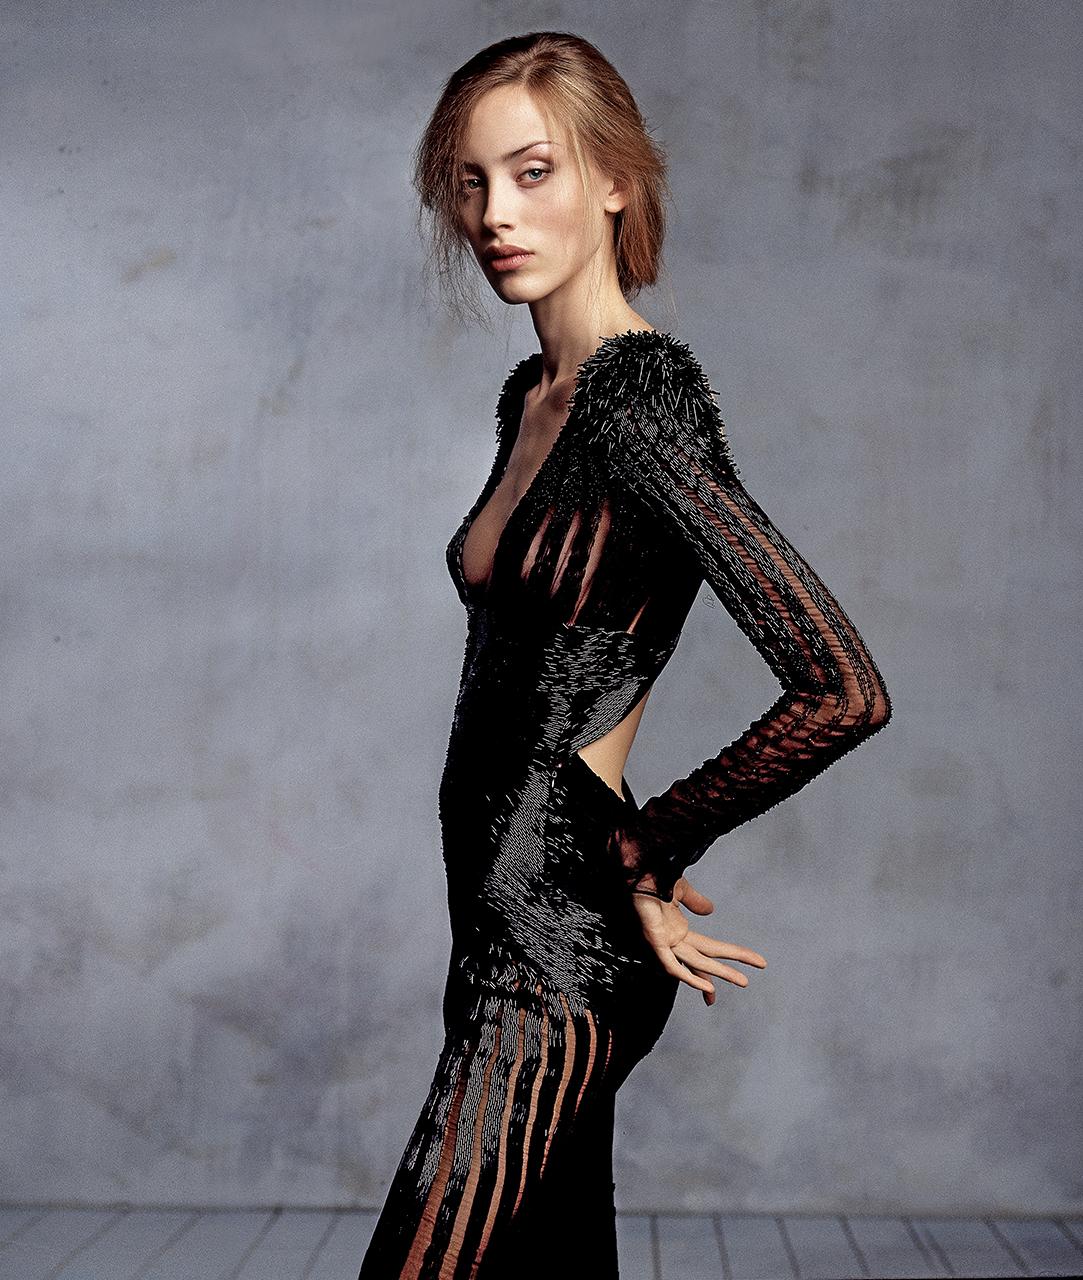 1.FT-Versace.Rachel-Kirby-15.jpg